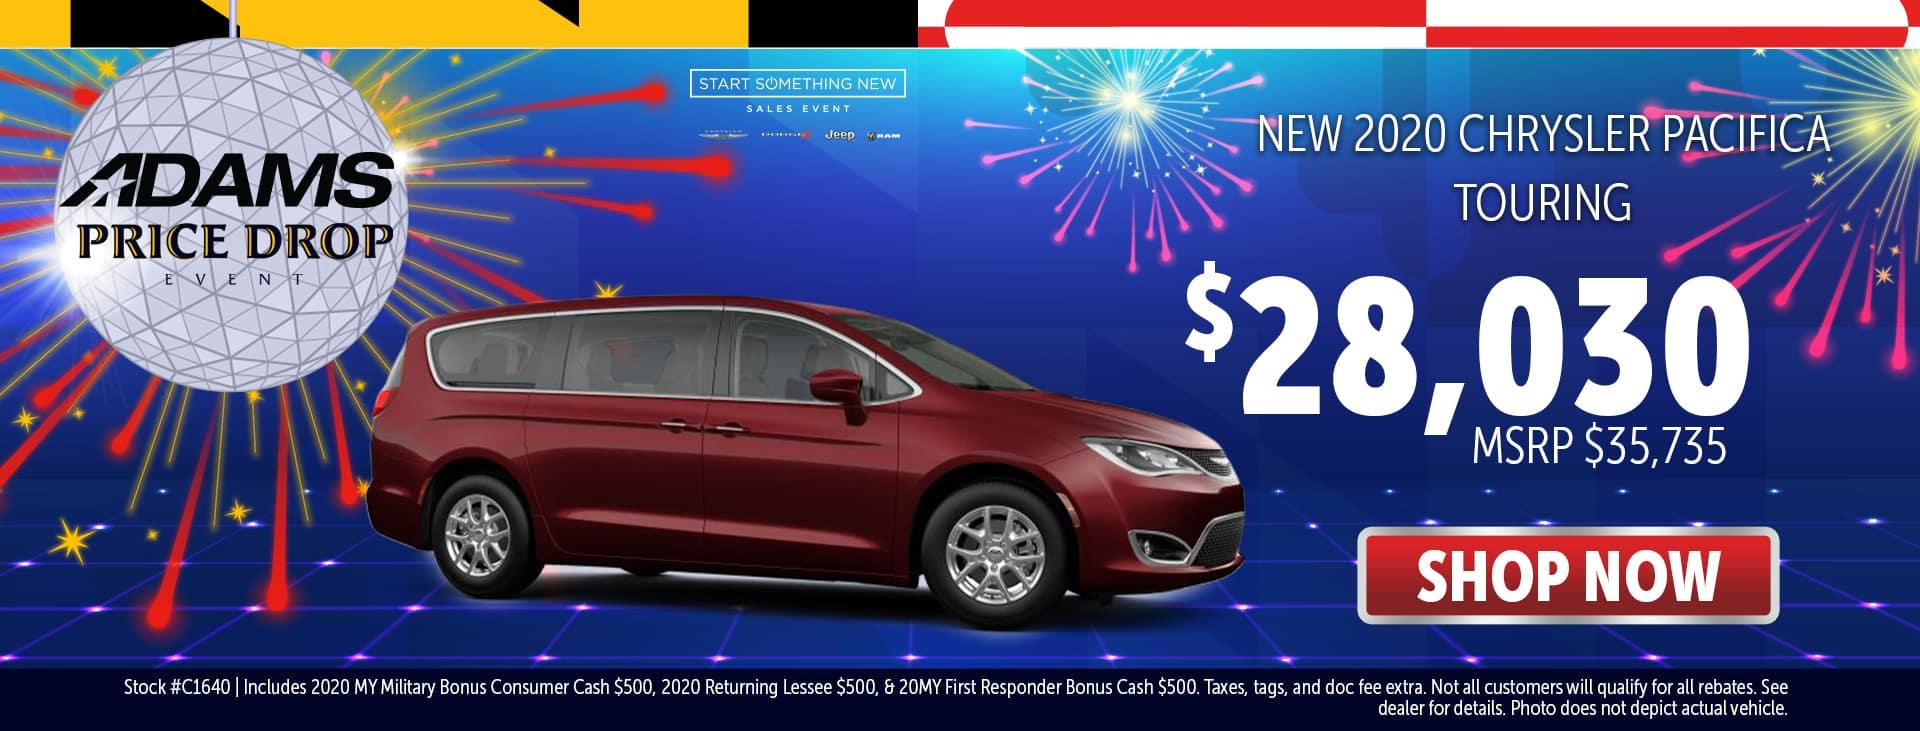 2020 Chrysler Pacifica for $28,030